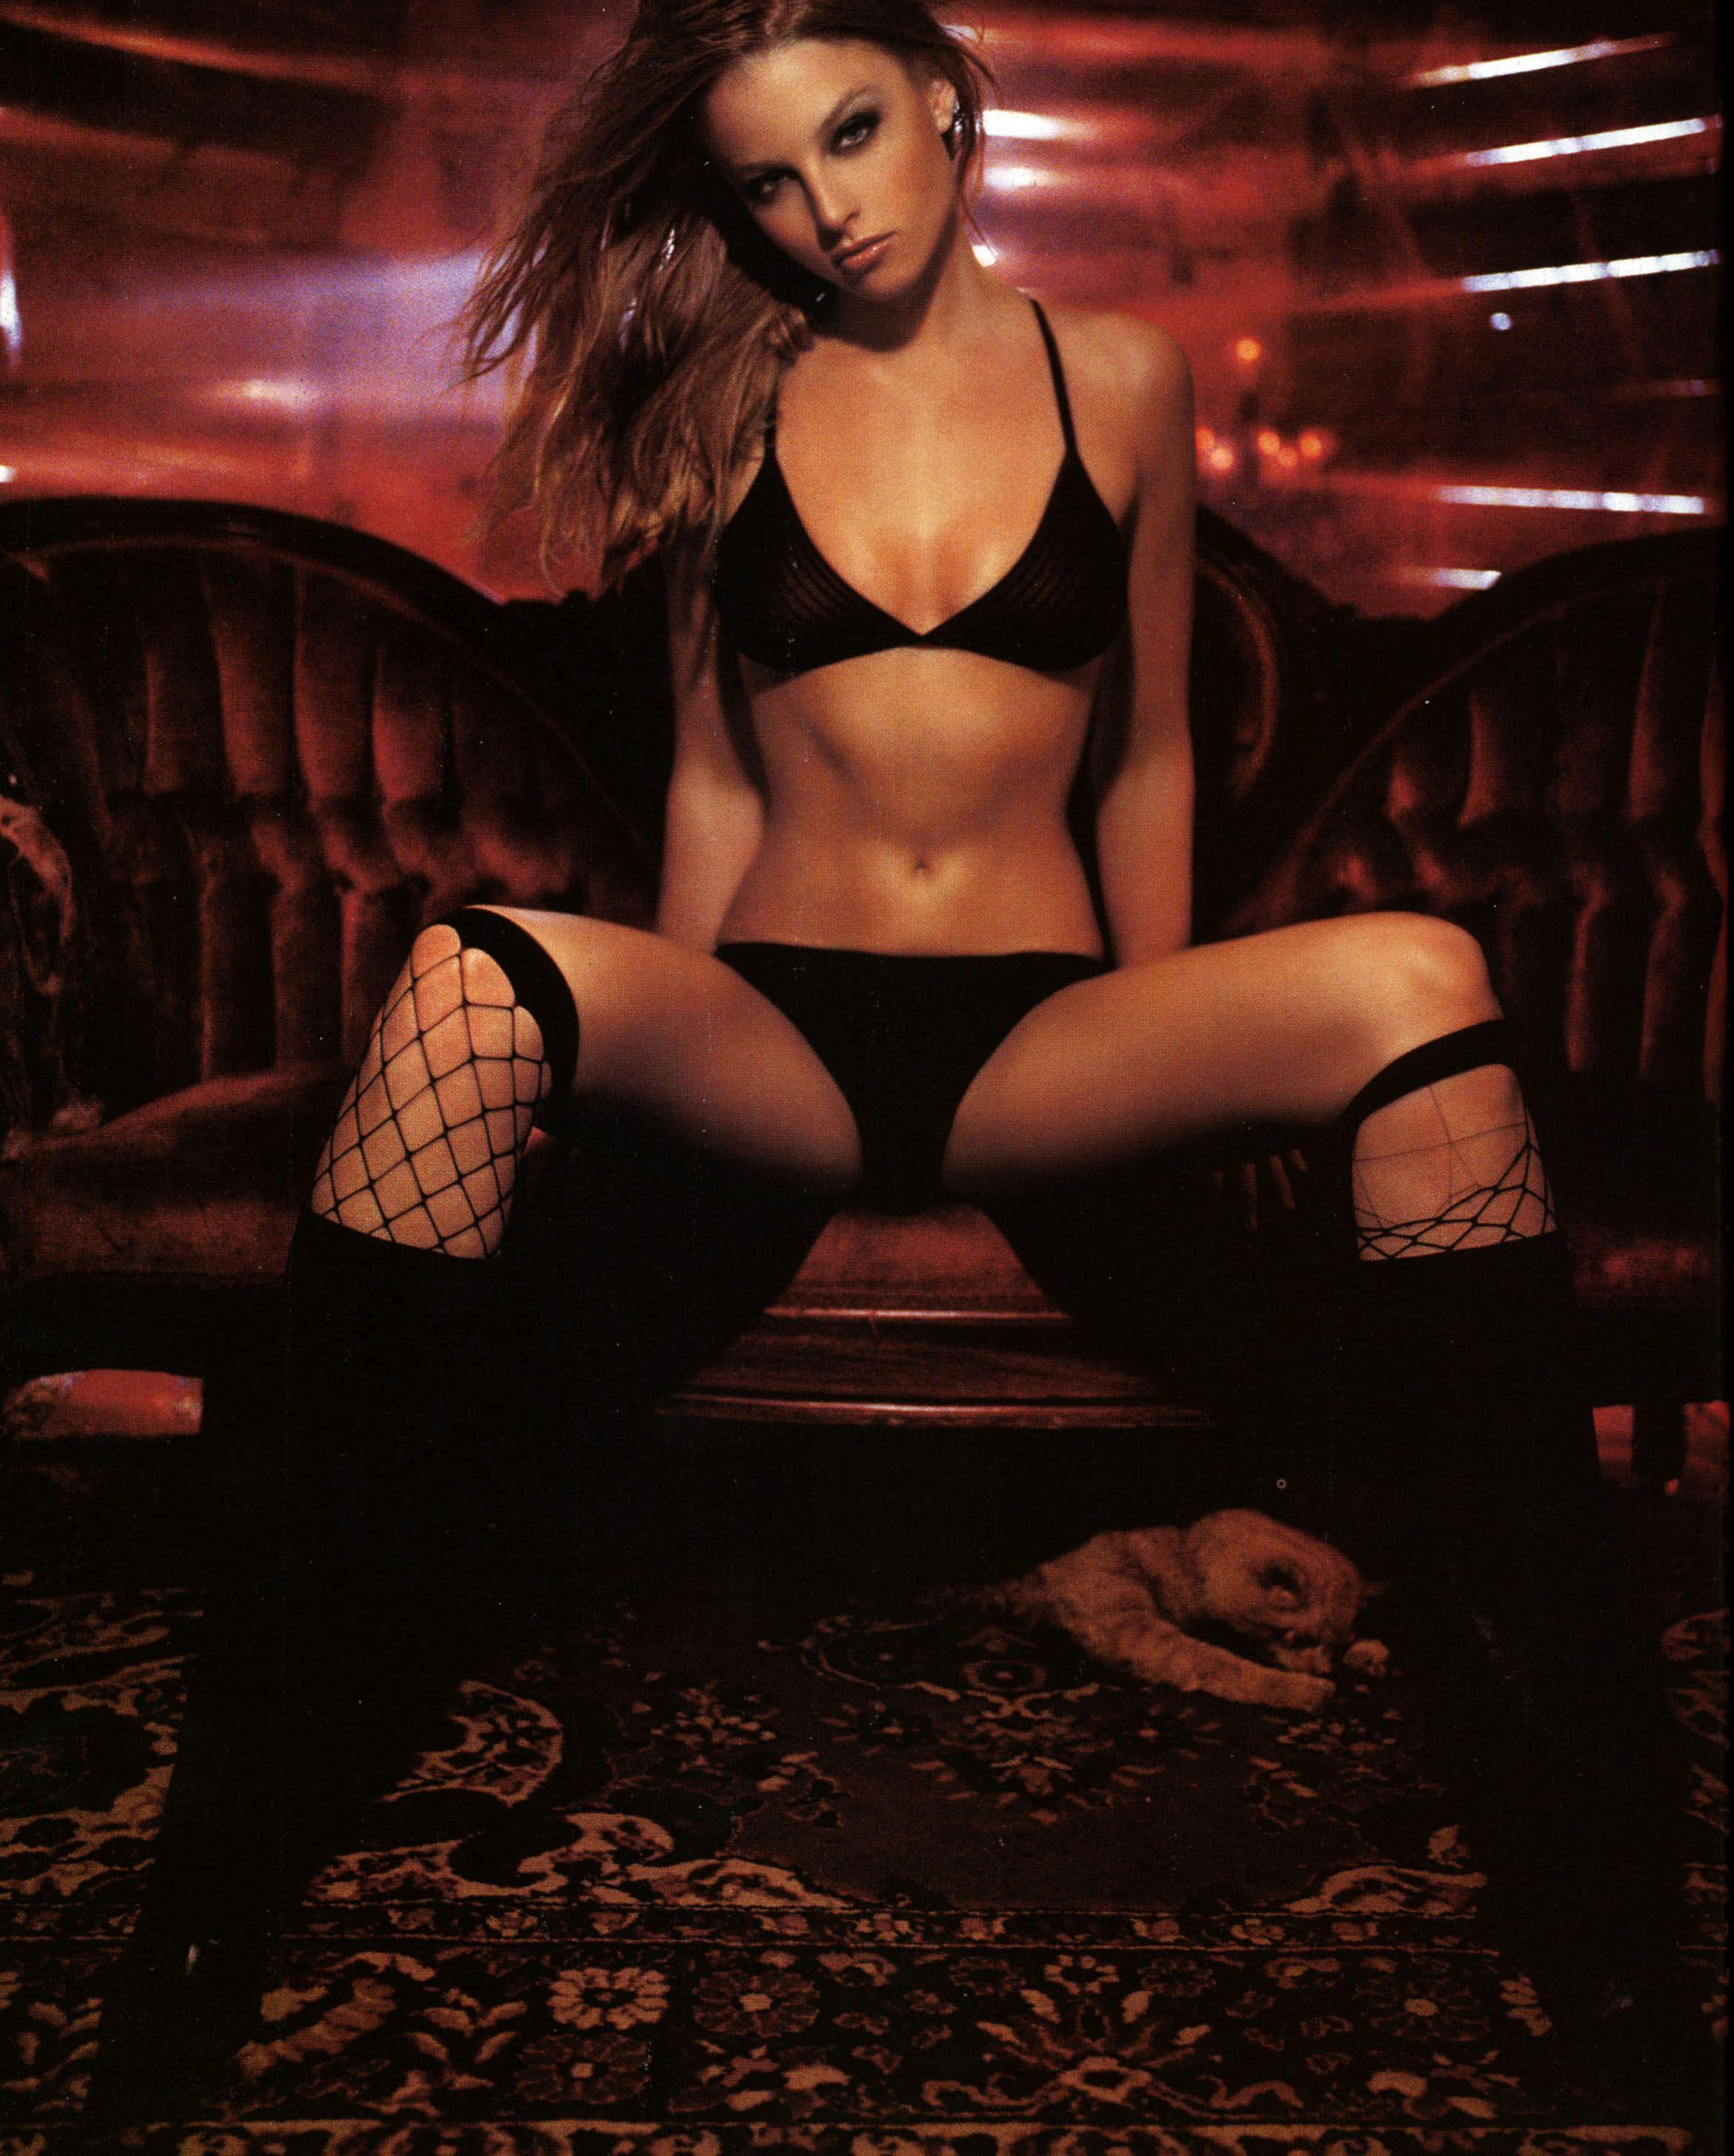 Рэйчел Николс фото на диване